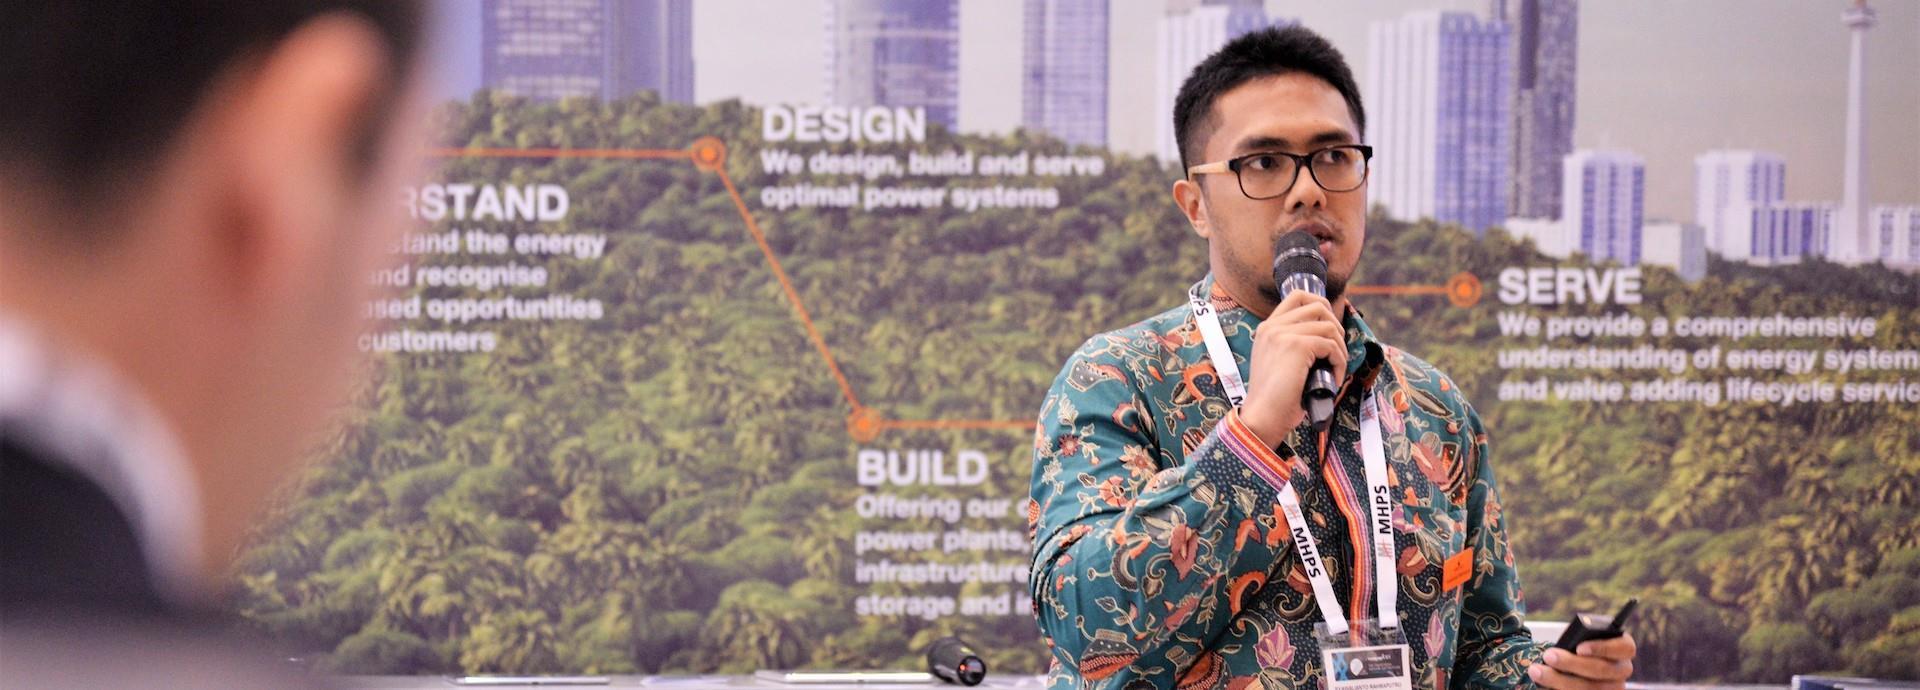 Syawalianto Rahmaputro presenting in Wartsila Booth during Powergen Asia in Jakarta